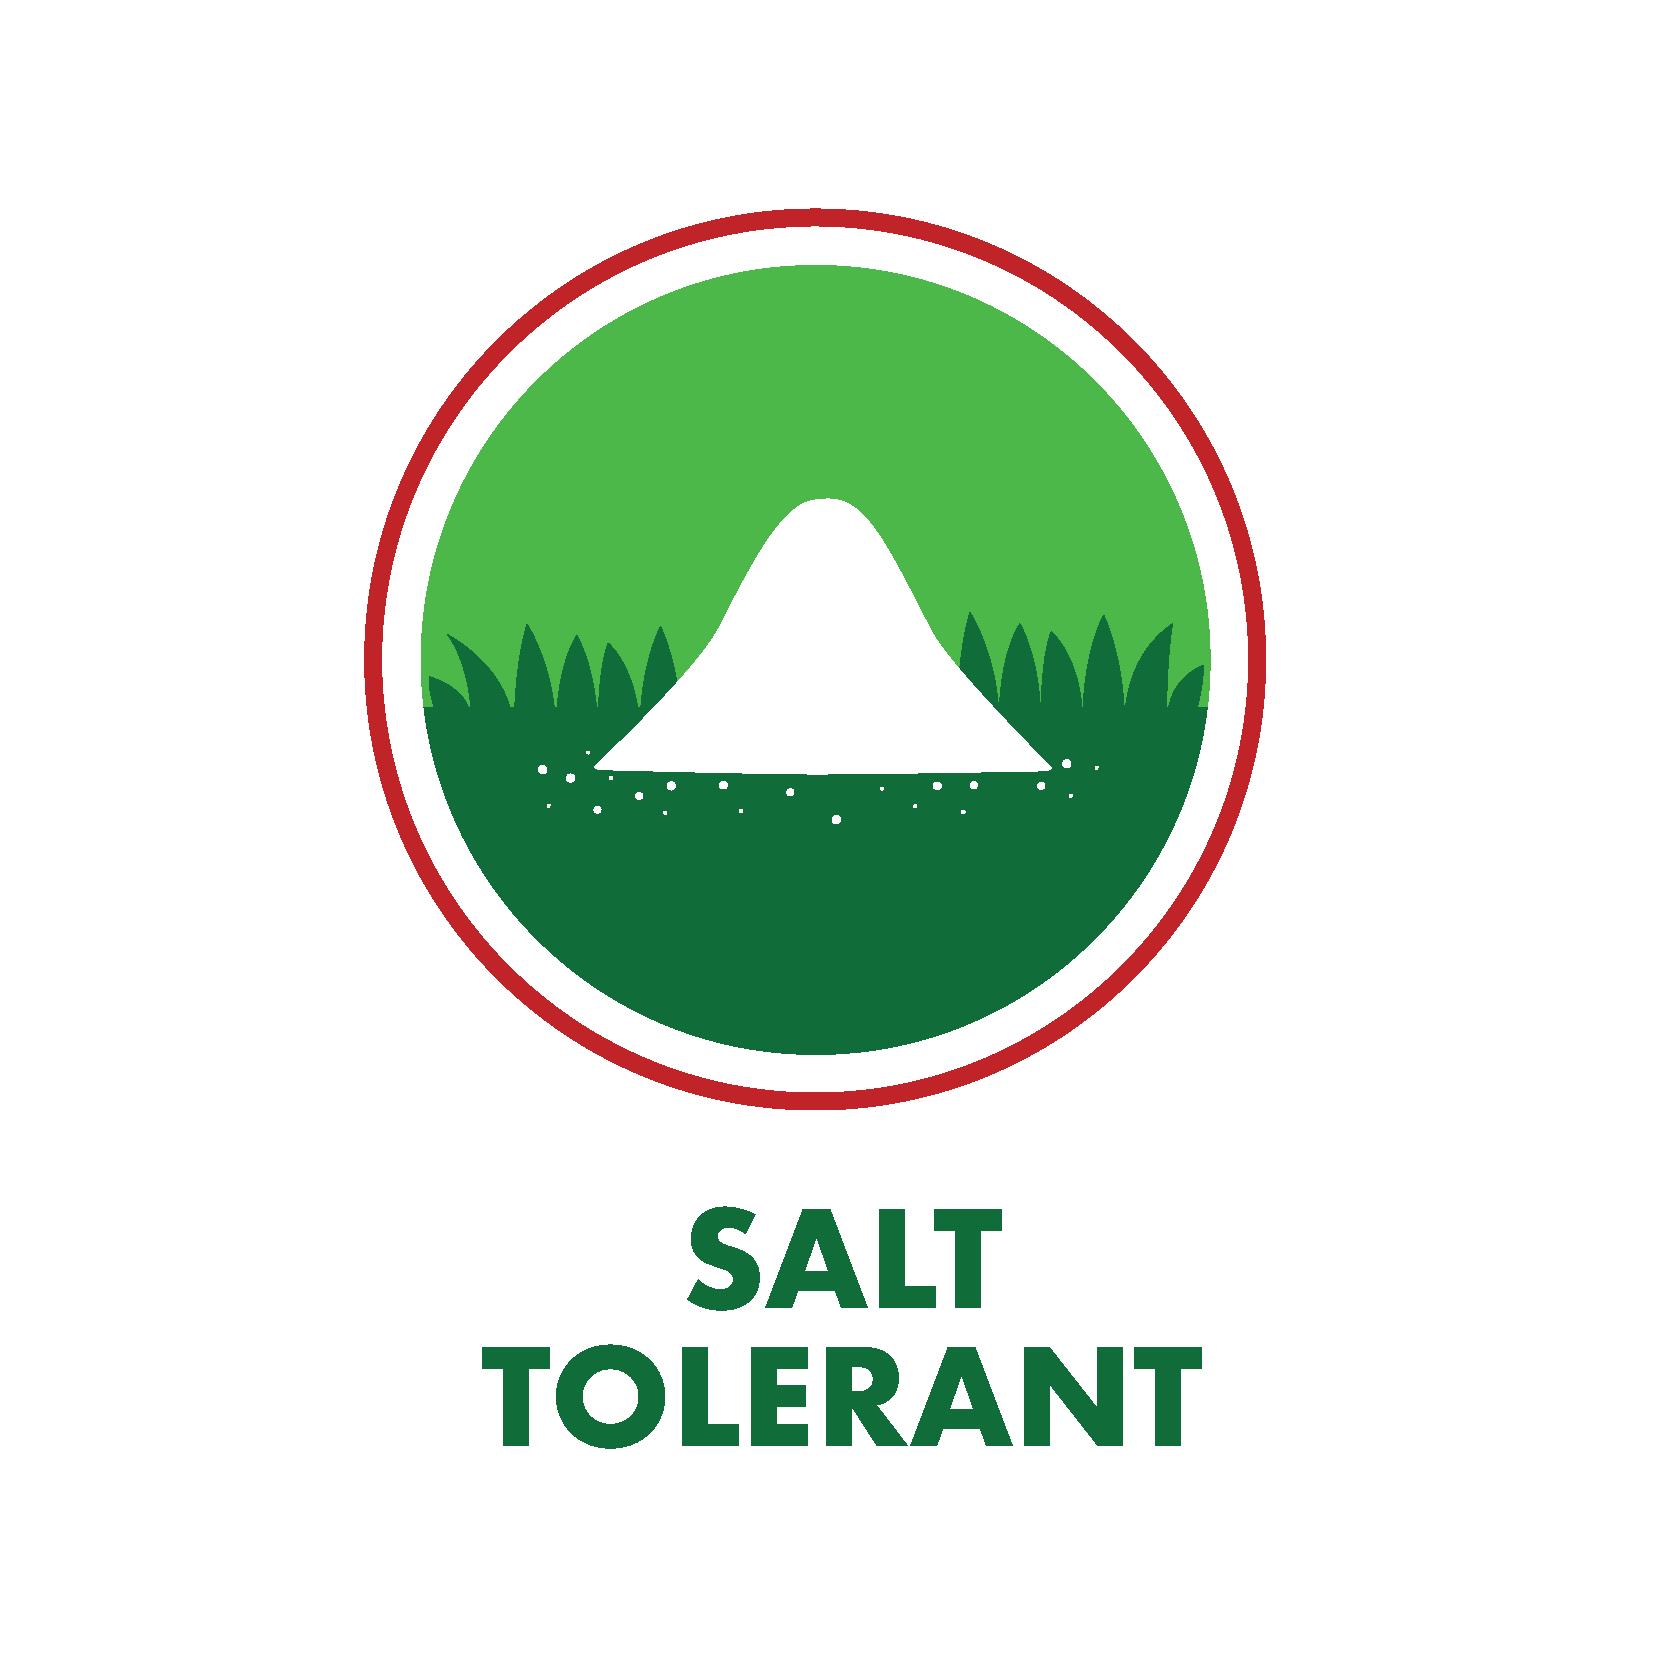 Salt tolerance